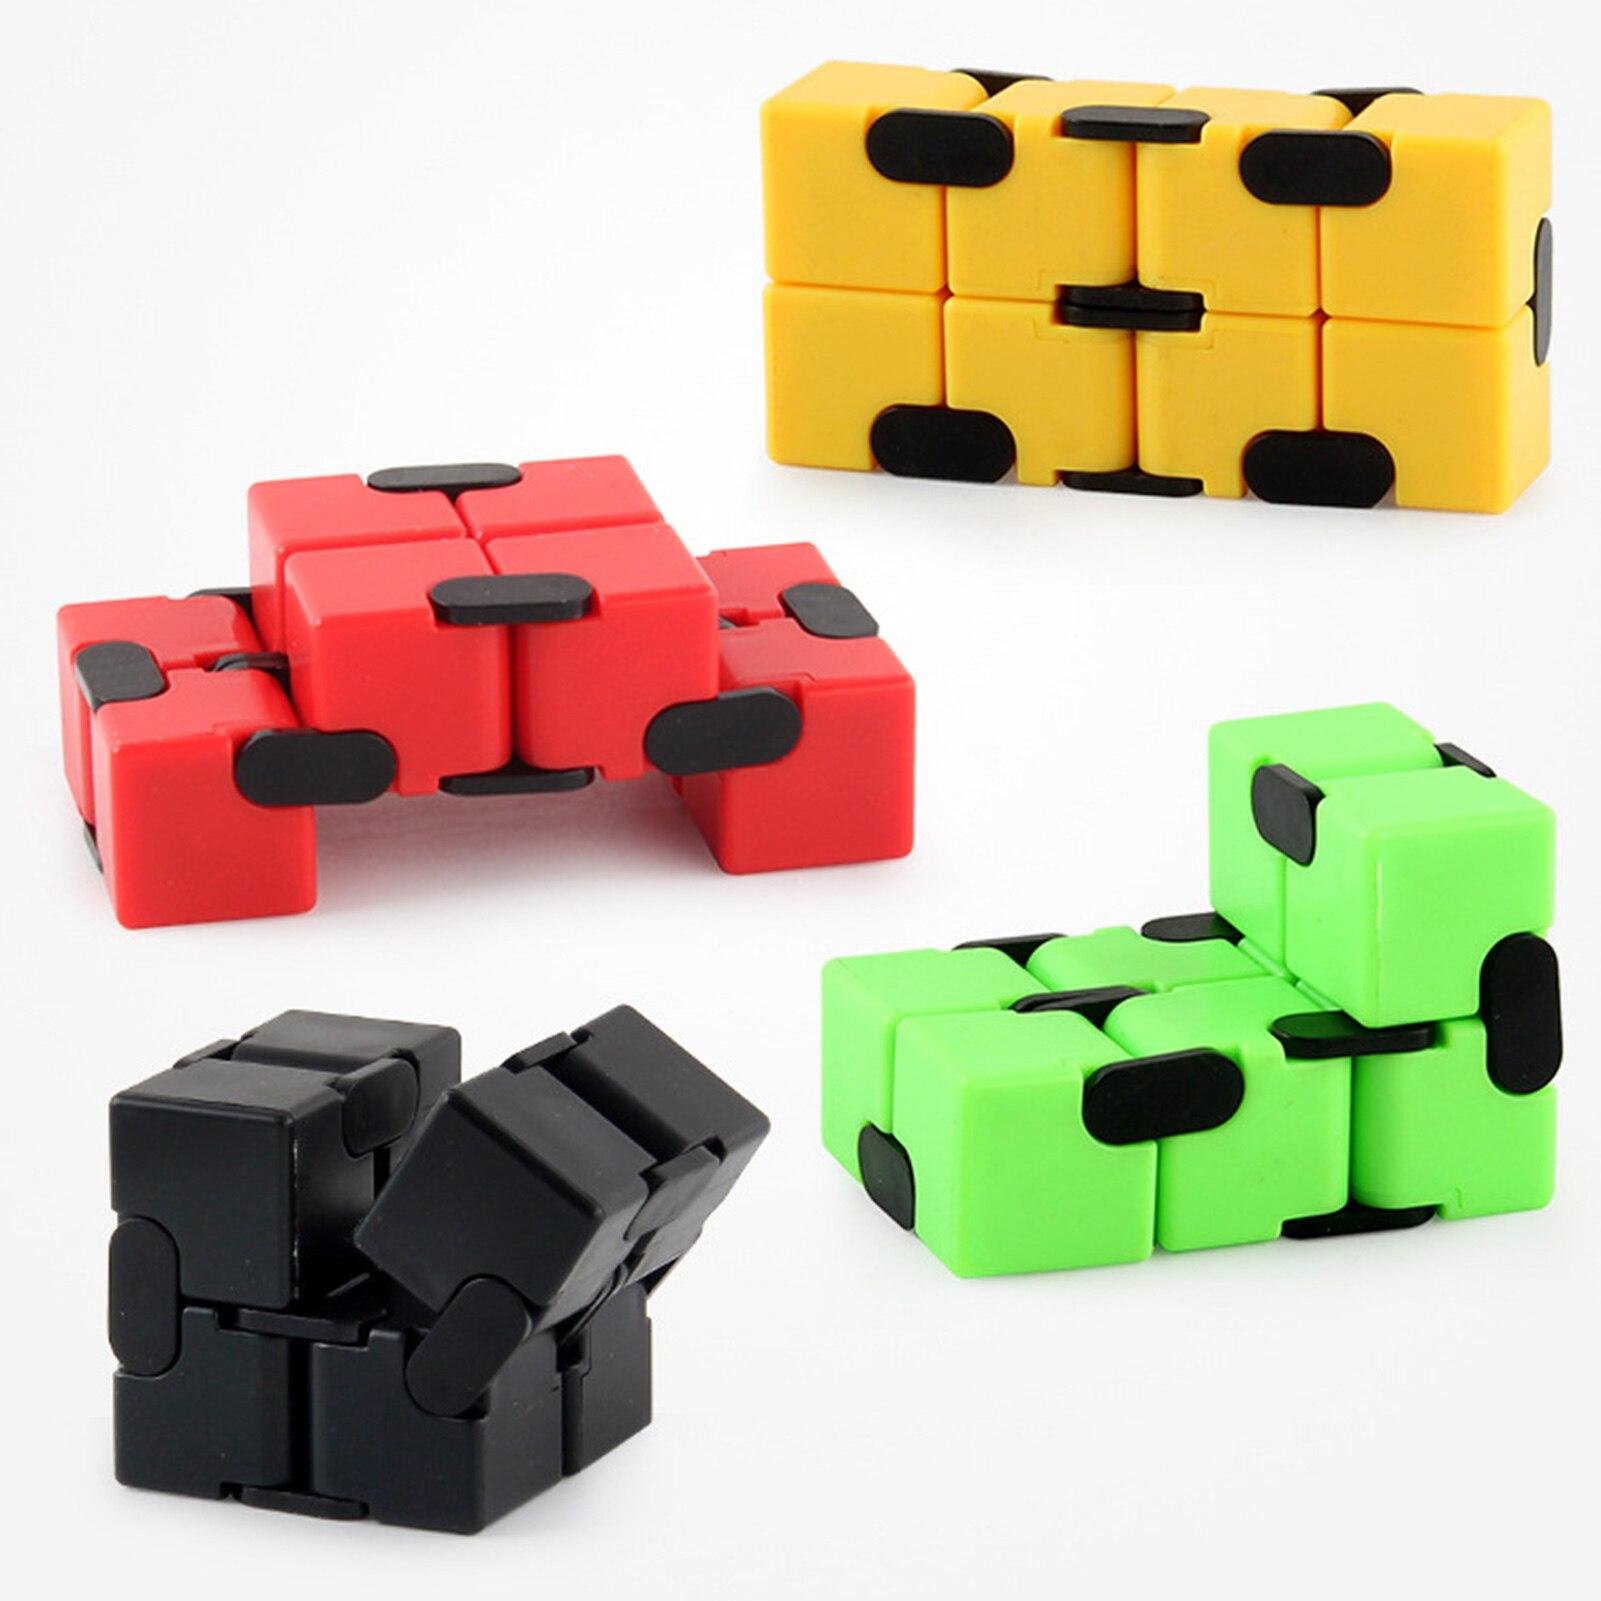 infinity cube cube block fidget toy 1469 - Wacky Track